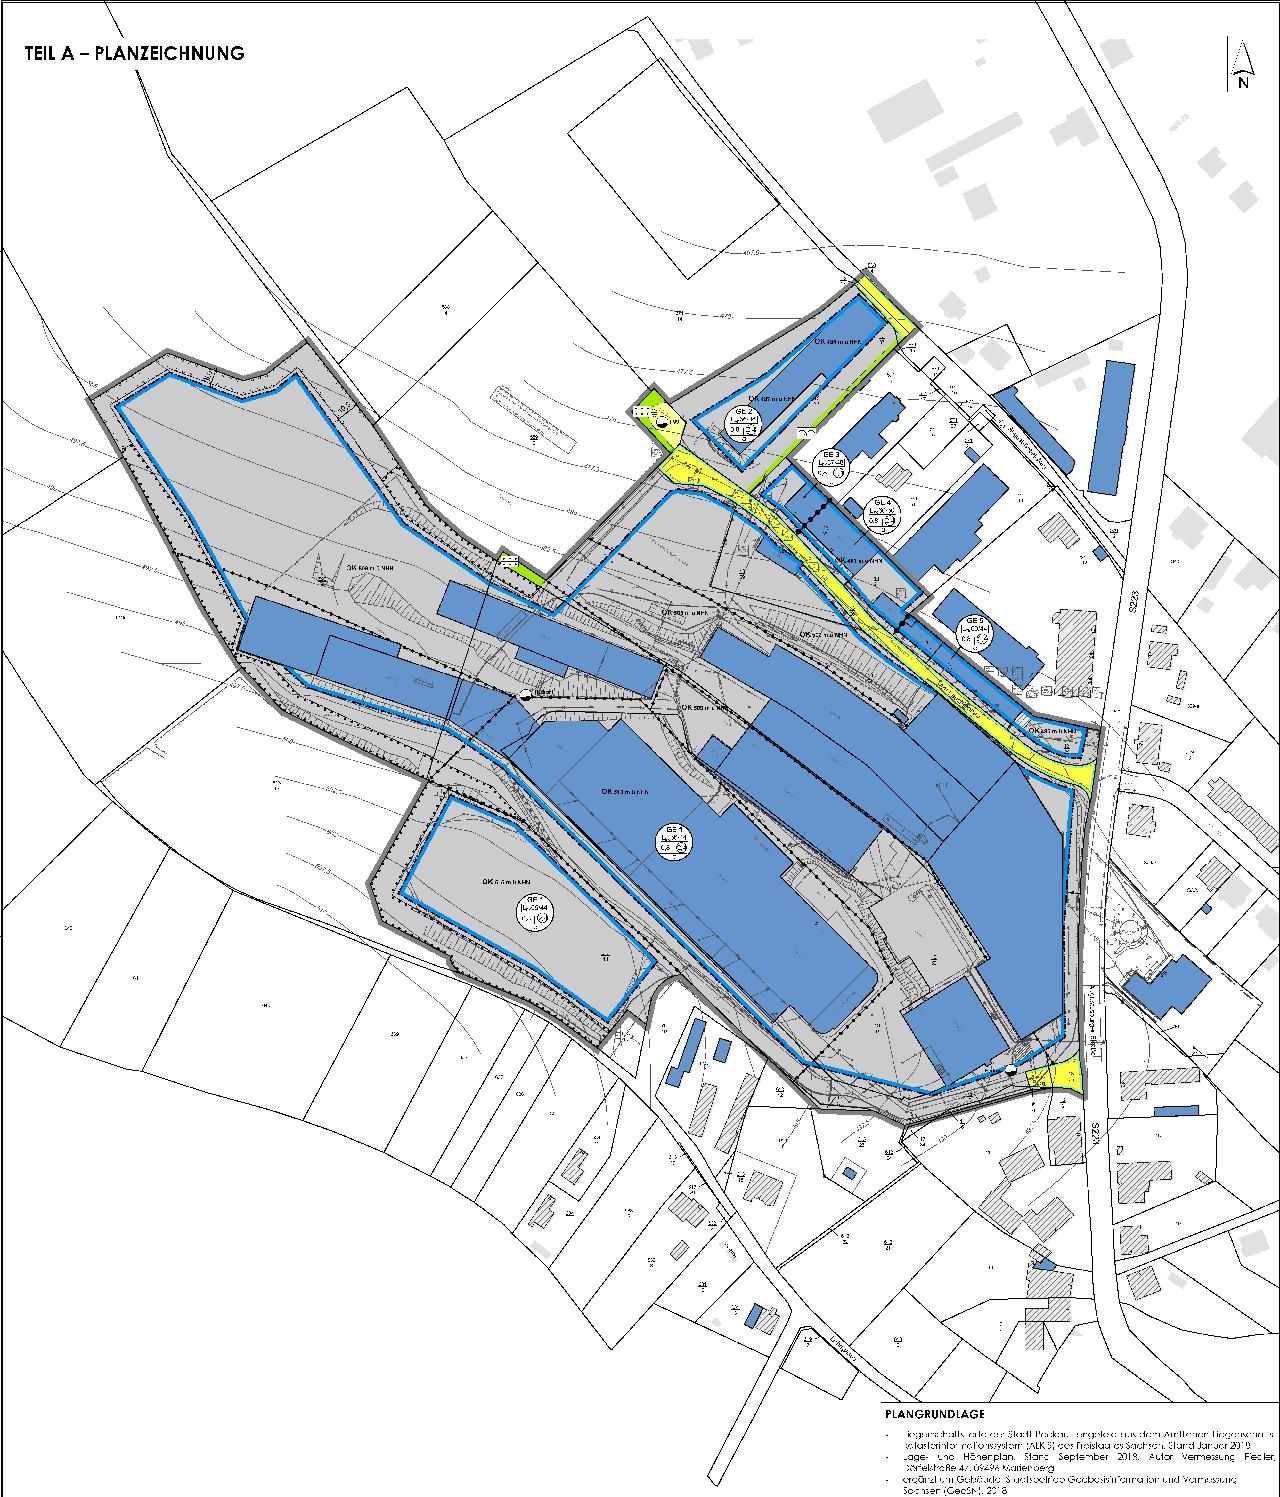 Zentrales Landesportal Bauleitplanung Sachsen - Bekanntmachung der on